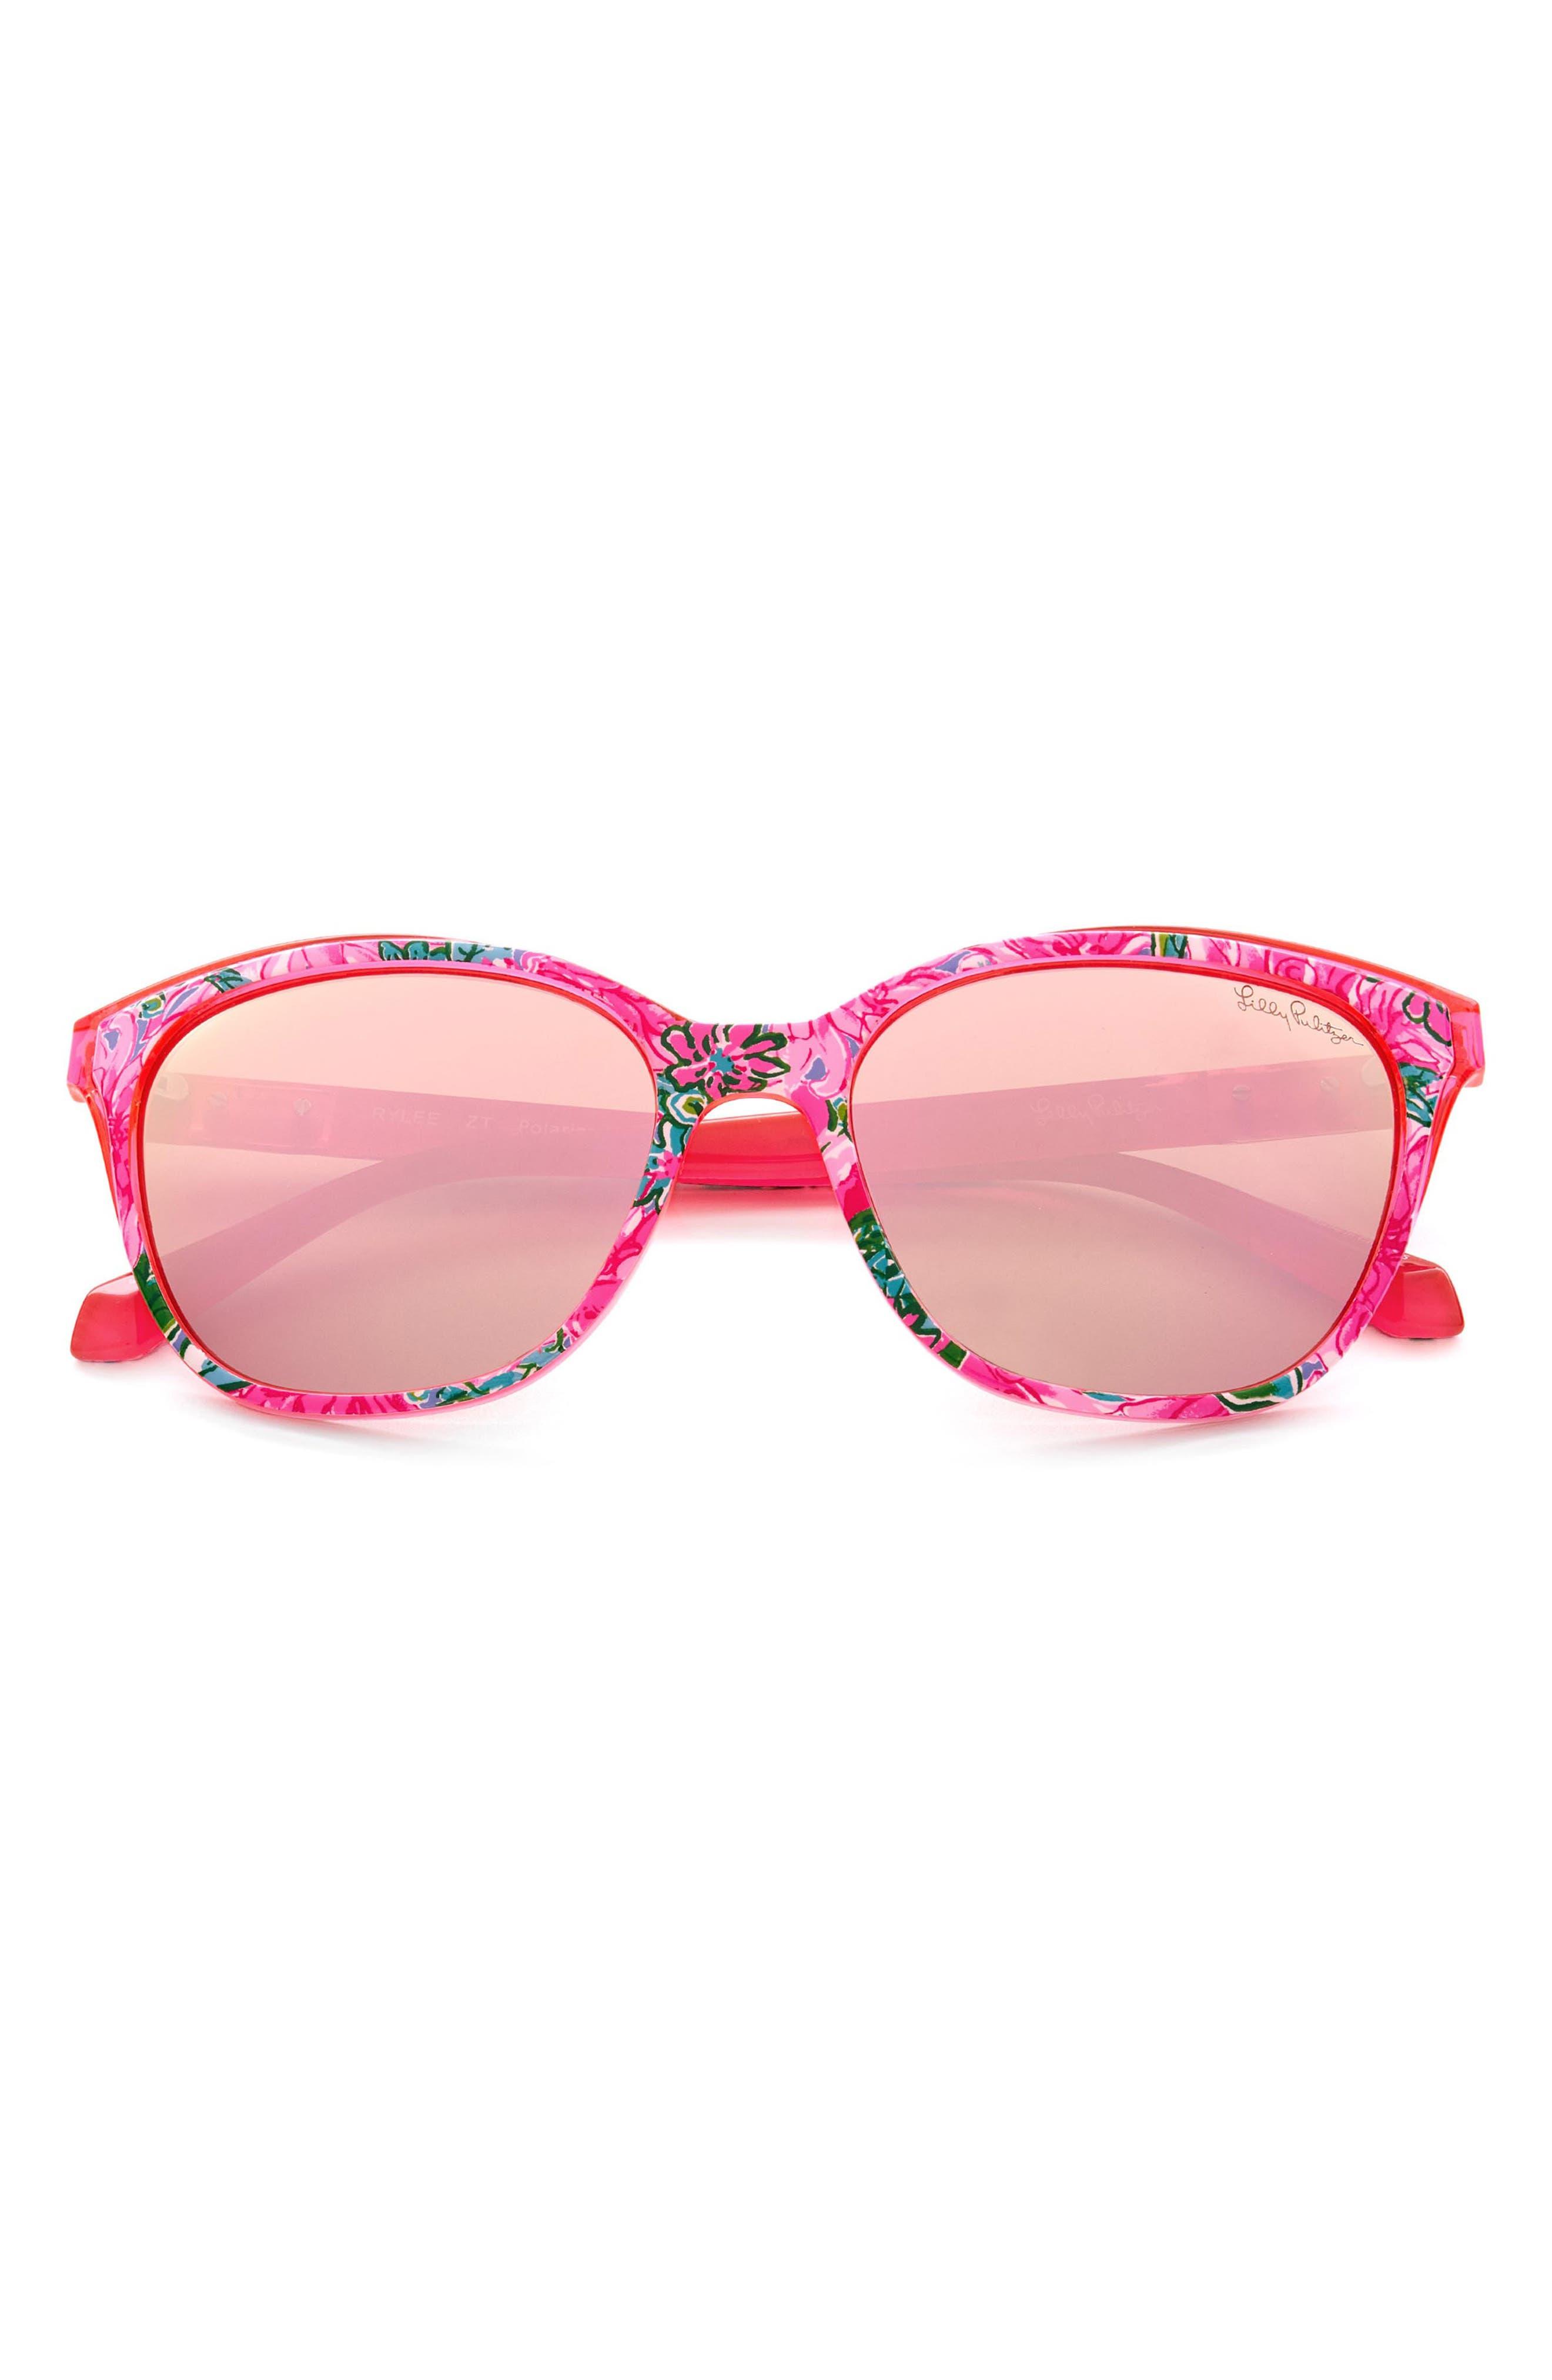 Women's Lilly Pulitzer 55mm Polarized Cat Eye Sunglasses